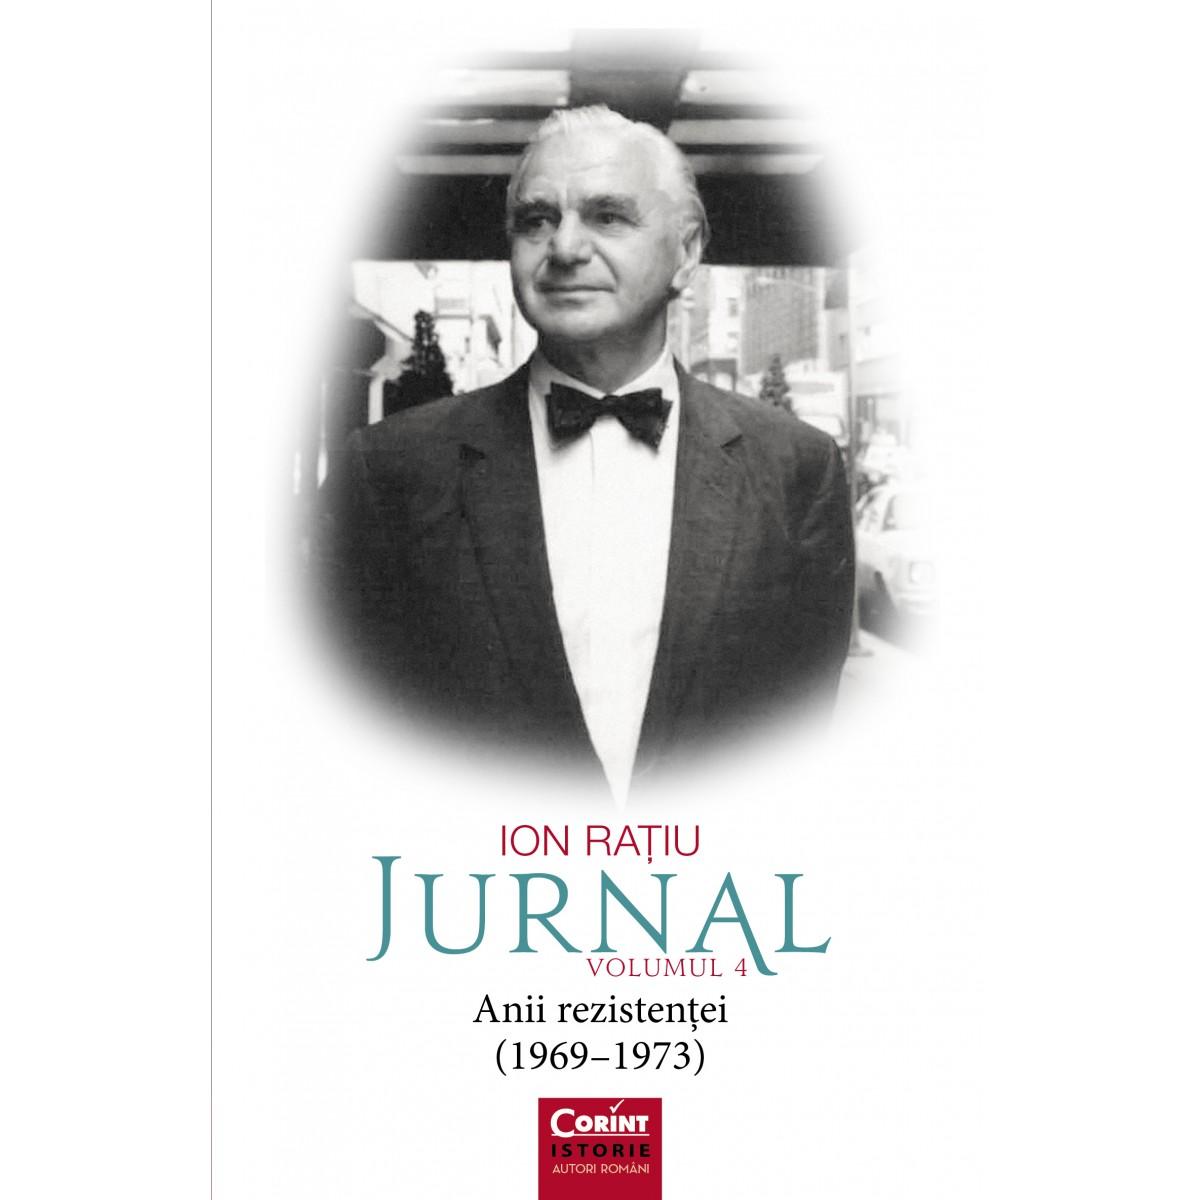 Ion Rațiu. Jurnal vol.4 - Editura Corint